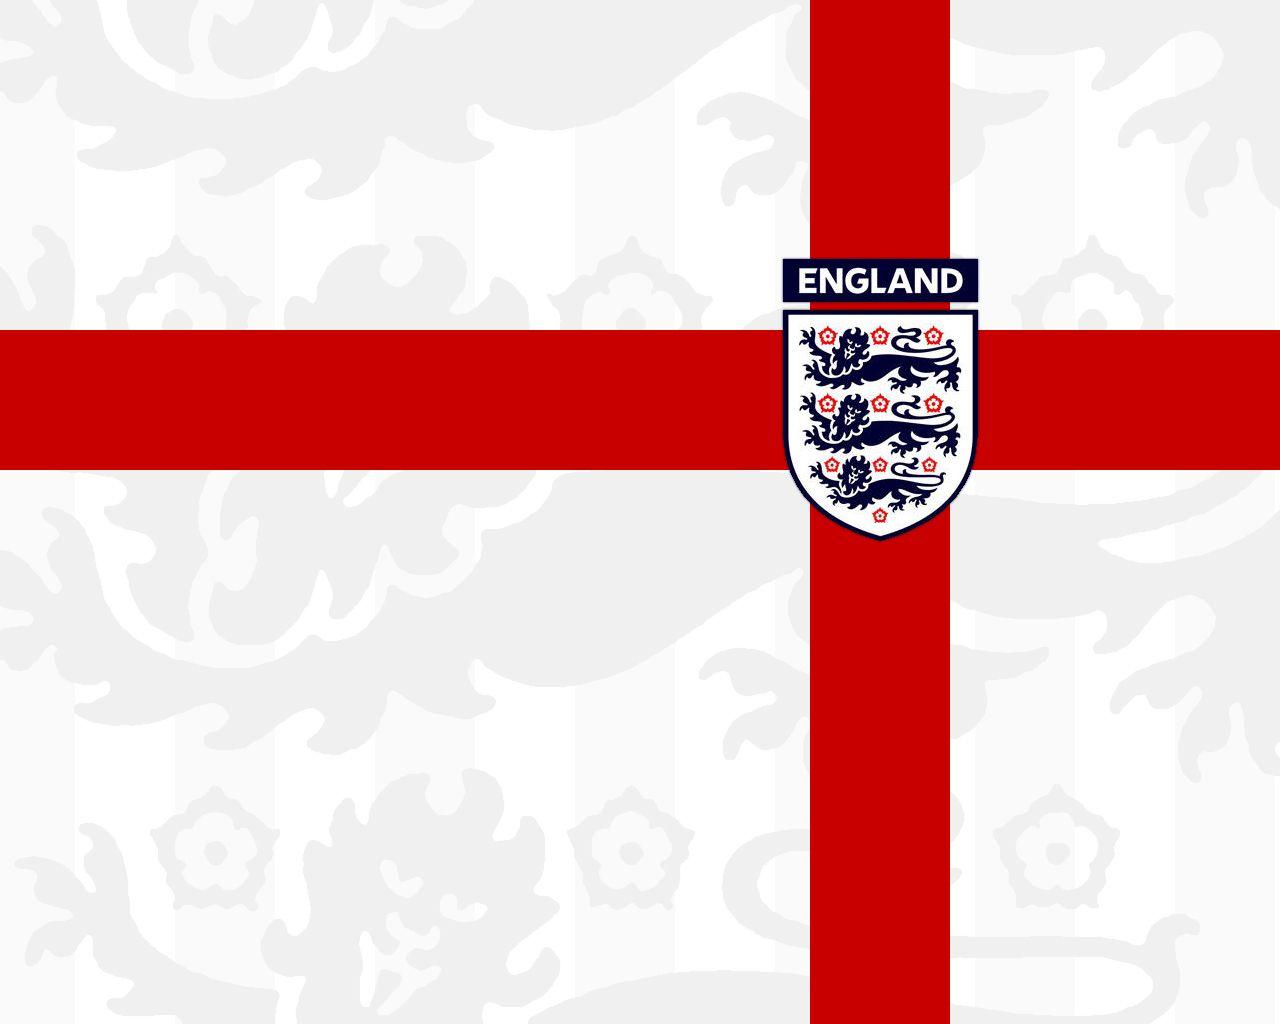 english flag wallpapers via     www wallsave com football team logo creator free football team logo creator online